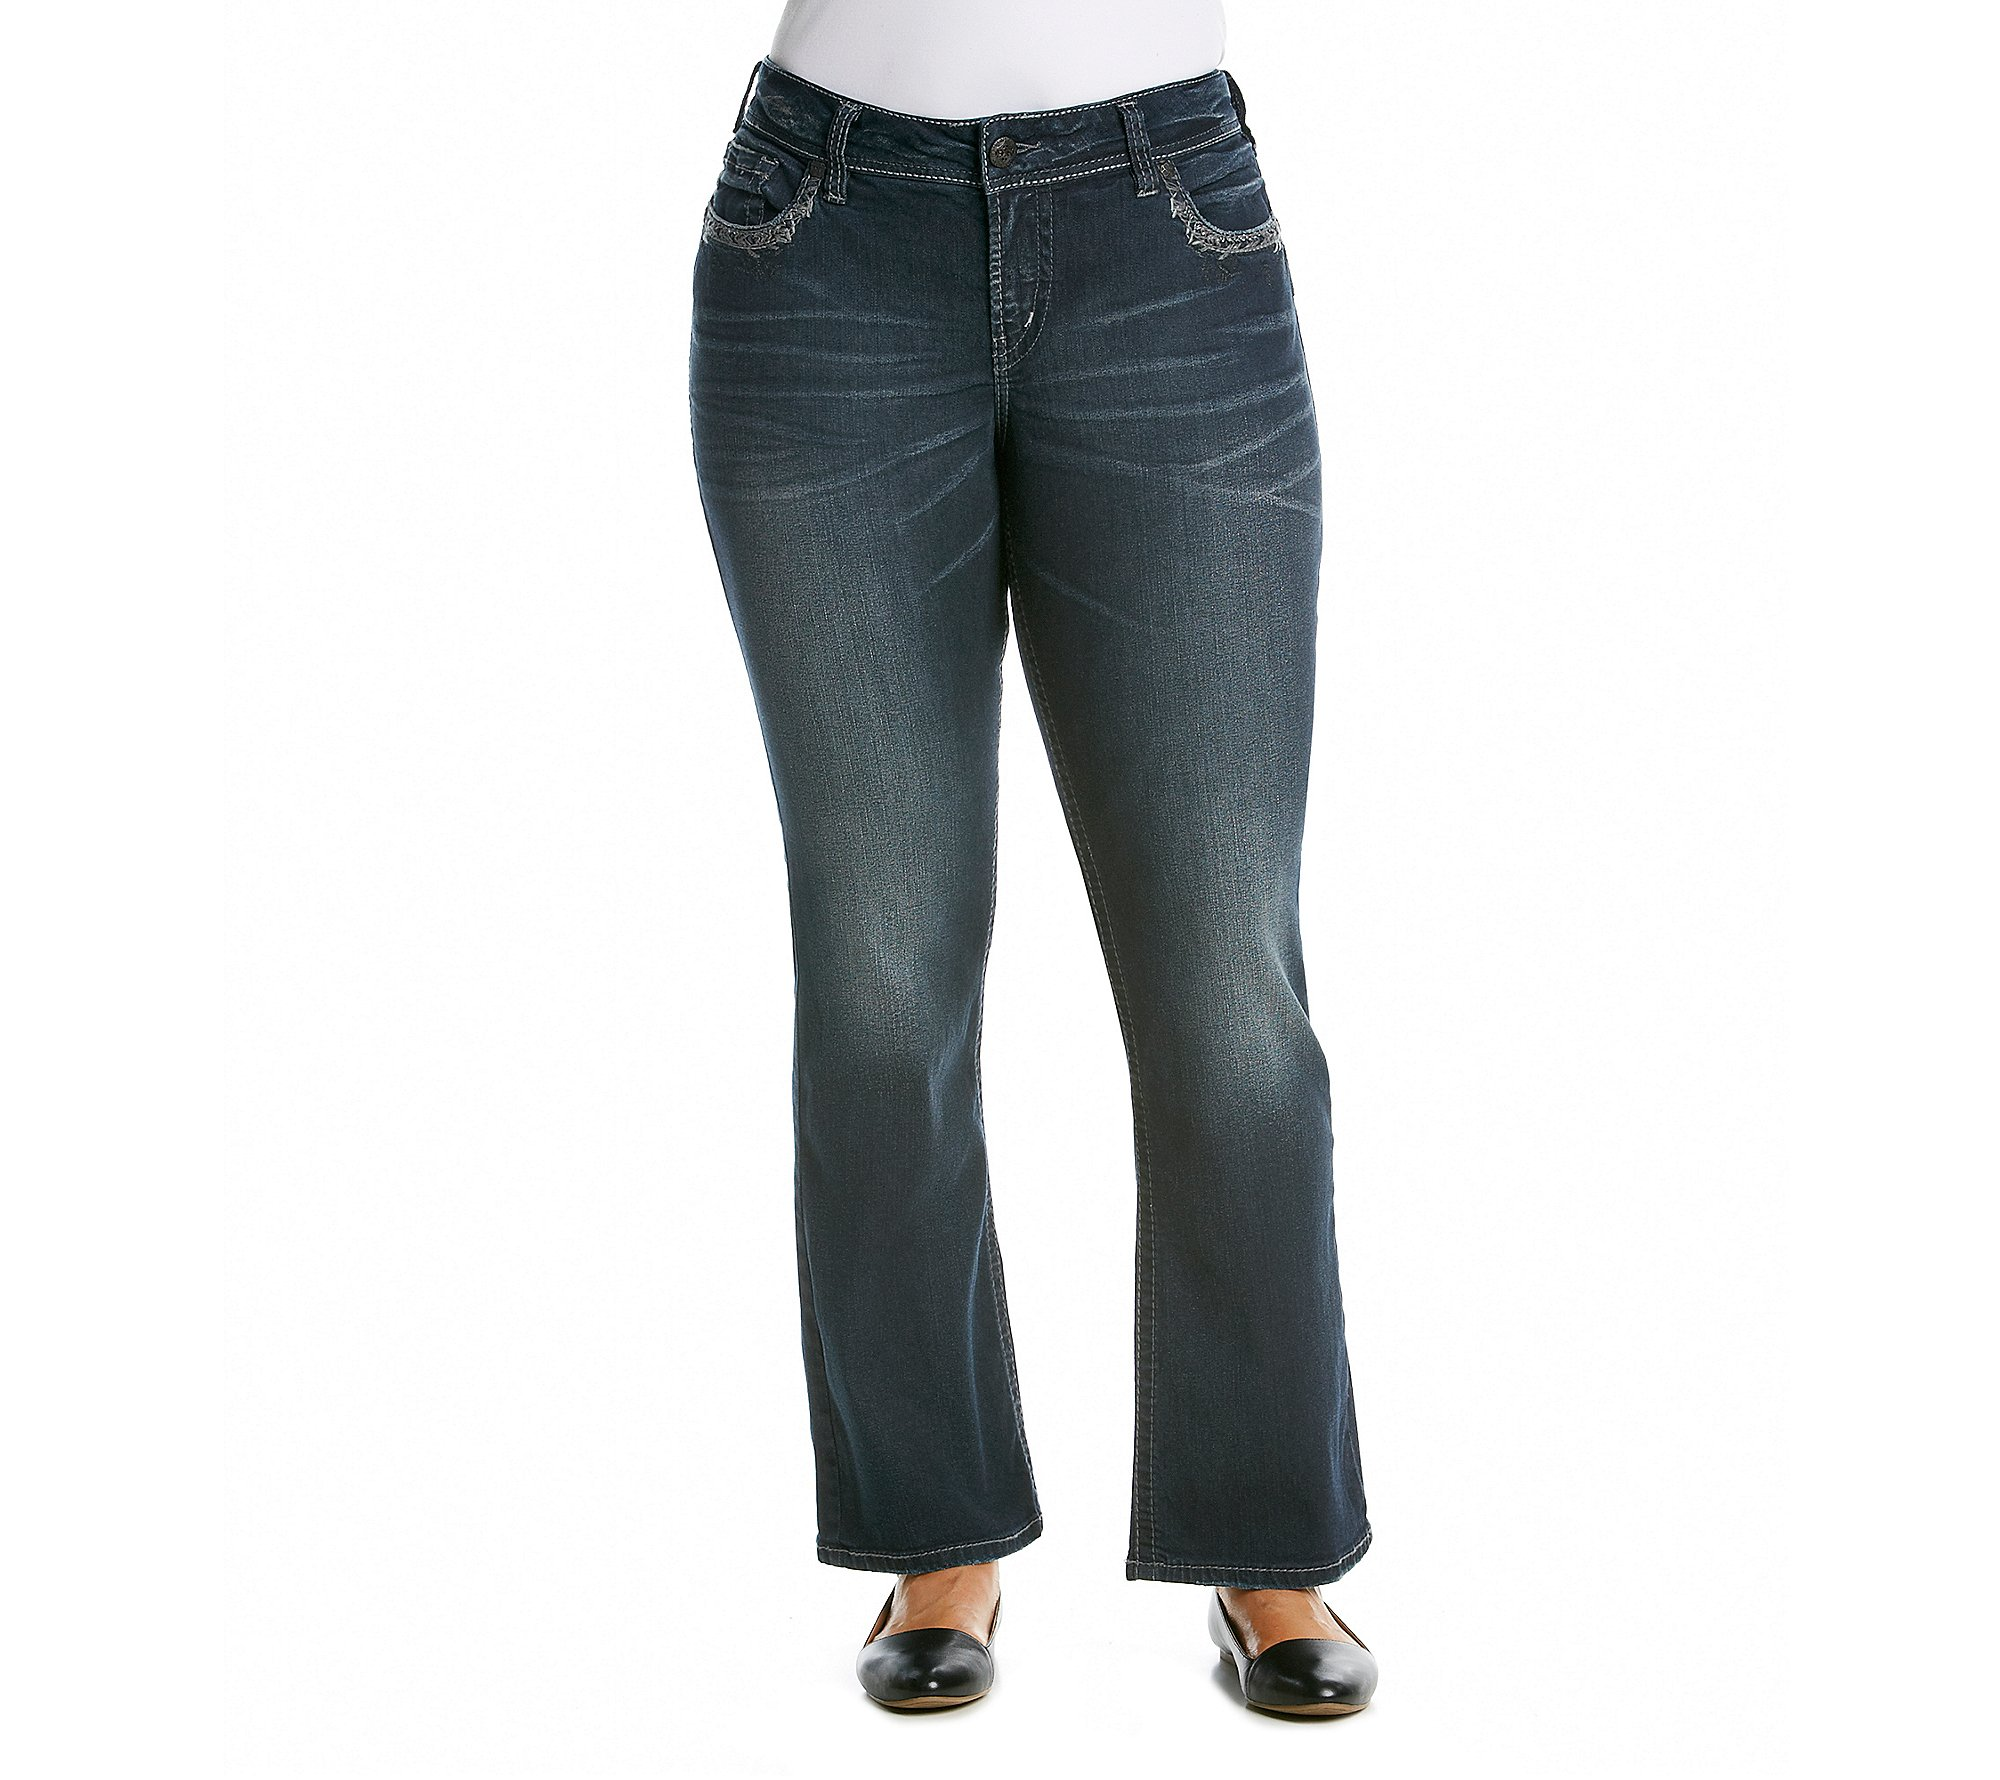 Silver Jeans Women's Plus-Size Suki Mid Rise Super Stretch Bootcut Jean, Indigo, 18x33 by Silver Jeans Co.